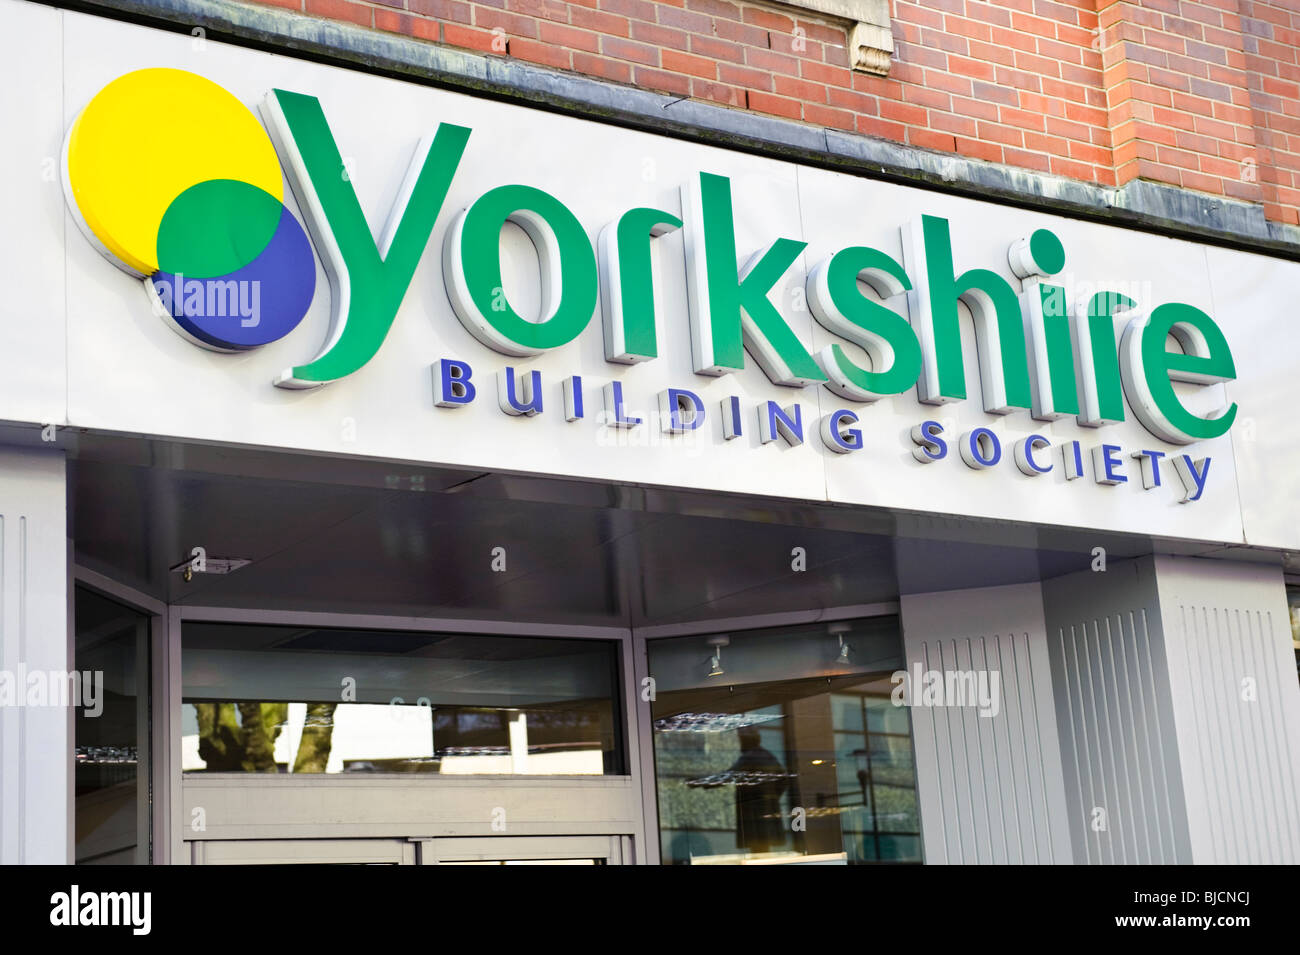 Yorkshire Building Society, Cardiff Wales UK Stockbild